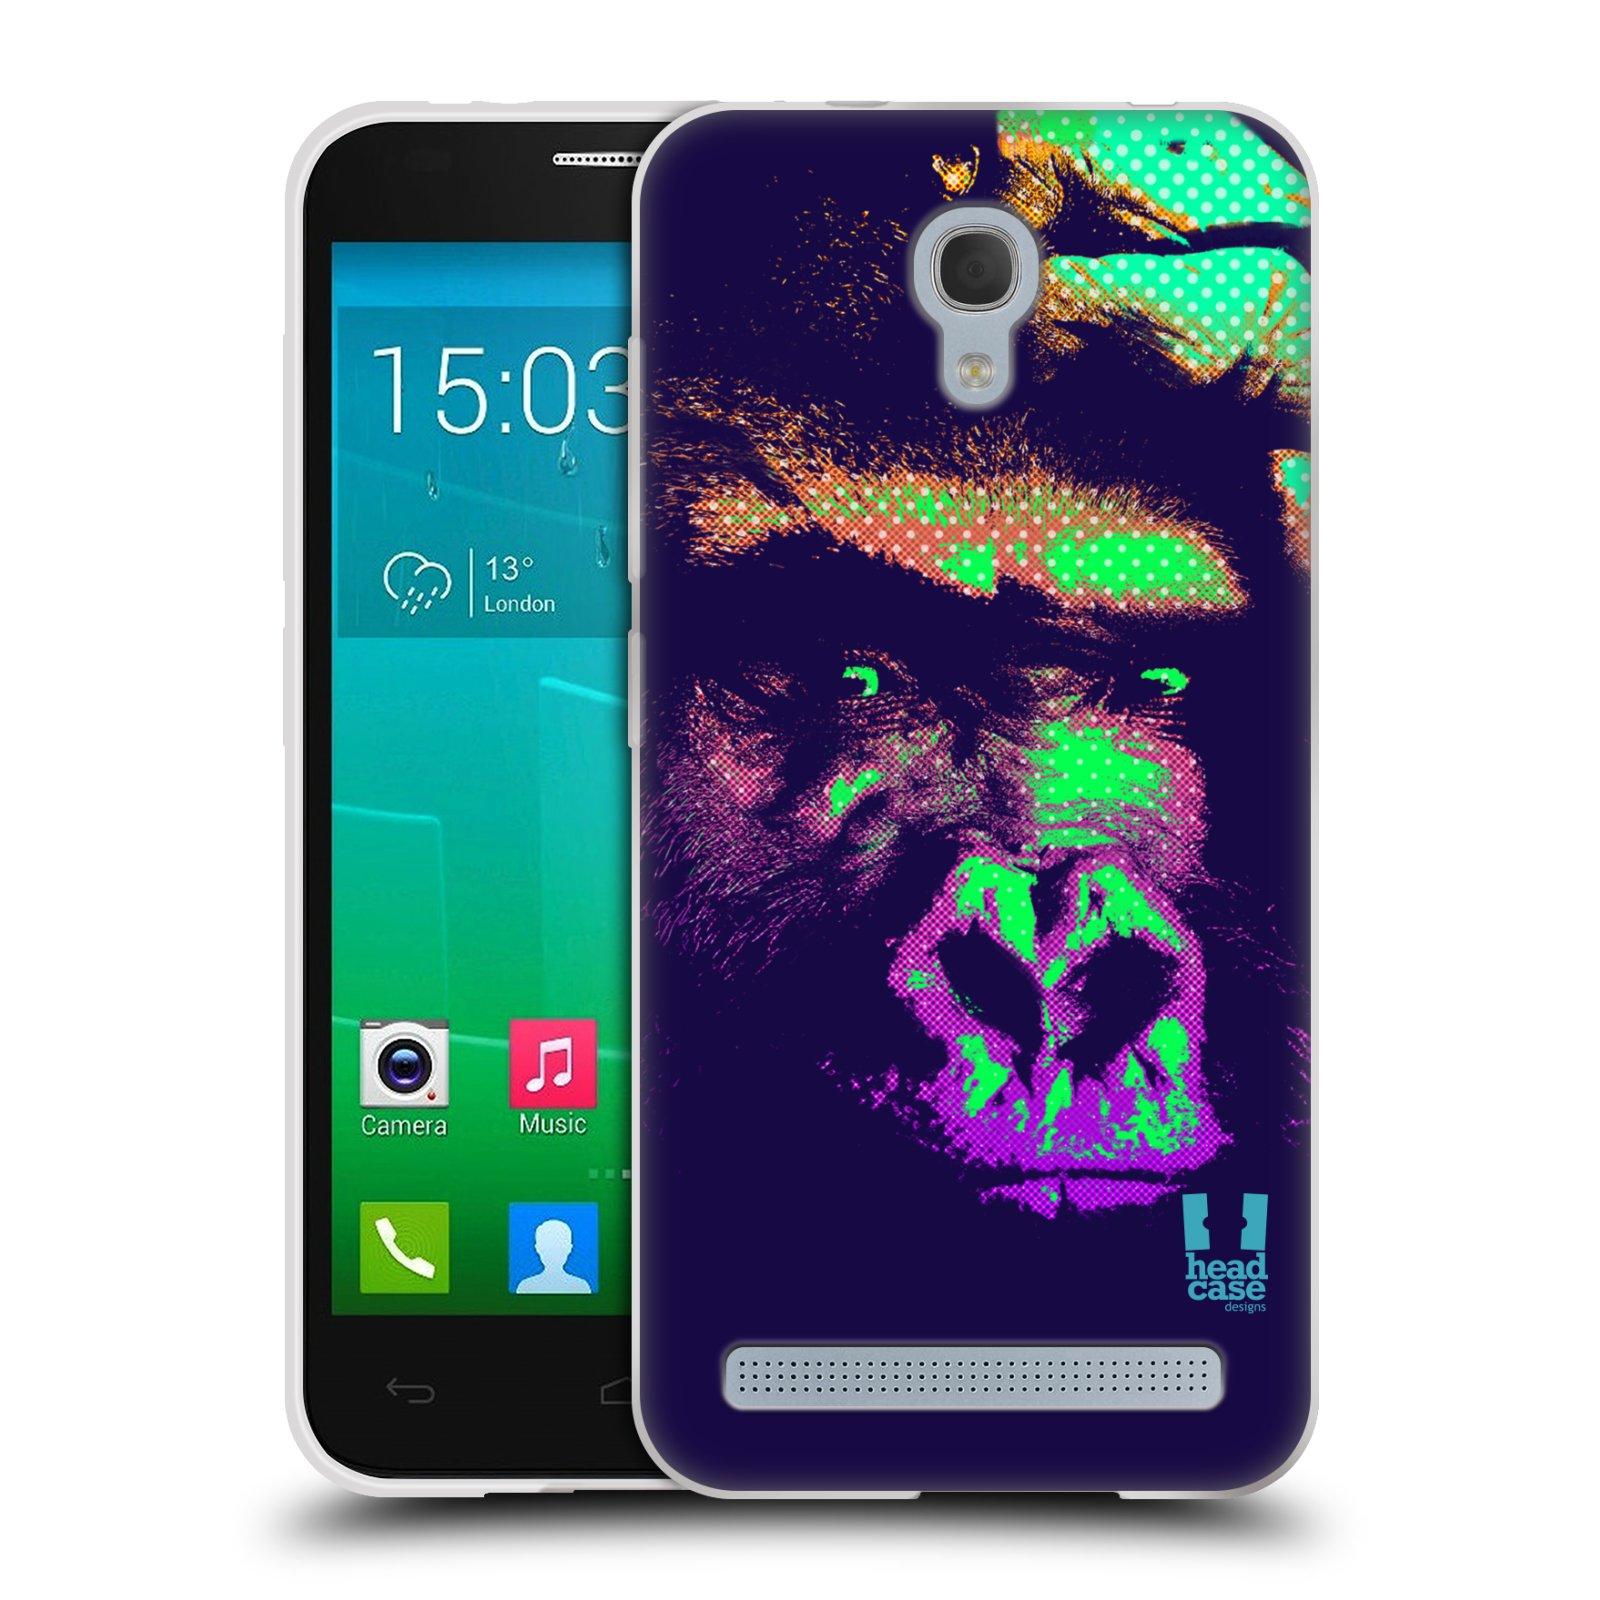 Silikonové pouzdro na mobil Alcatel One Touch Idol 2 Mini S 6036Y HEAD CASE POP PRINT GORILA (Silikonový kryt či obal na mobilní telefon Alcatel Idol 2 Mini S OT-6036Y)